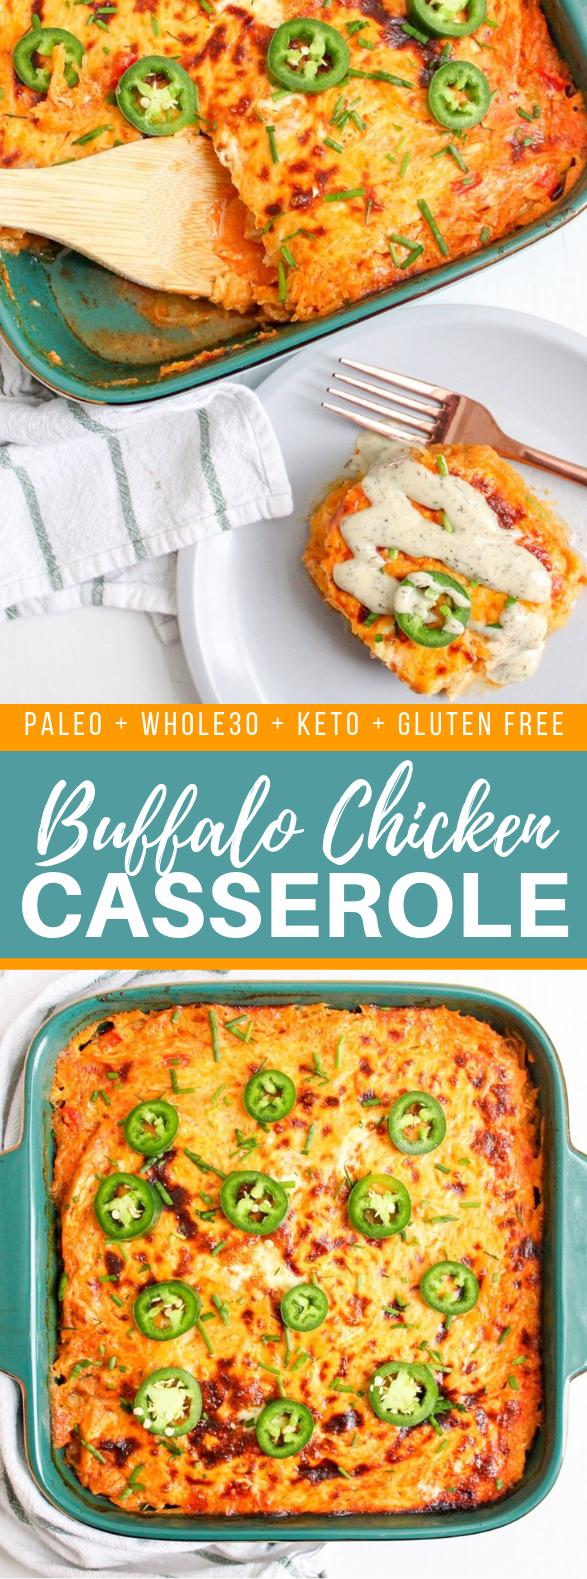 BUFFALO CHICKEN CASSEROLE – PALEO/WHOLE30 #healthy #diet